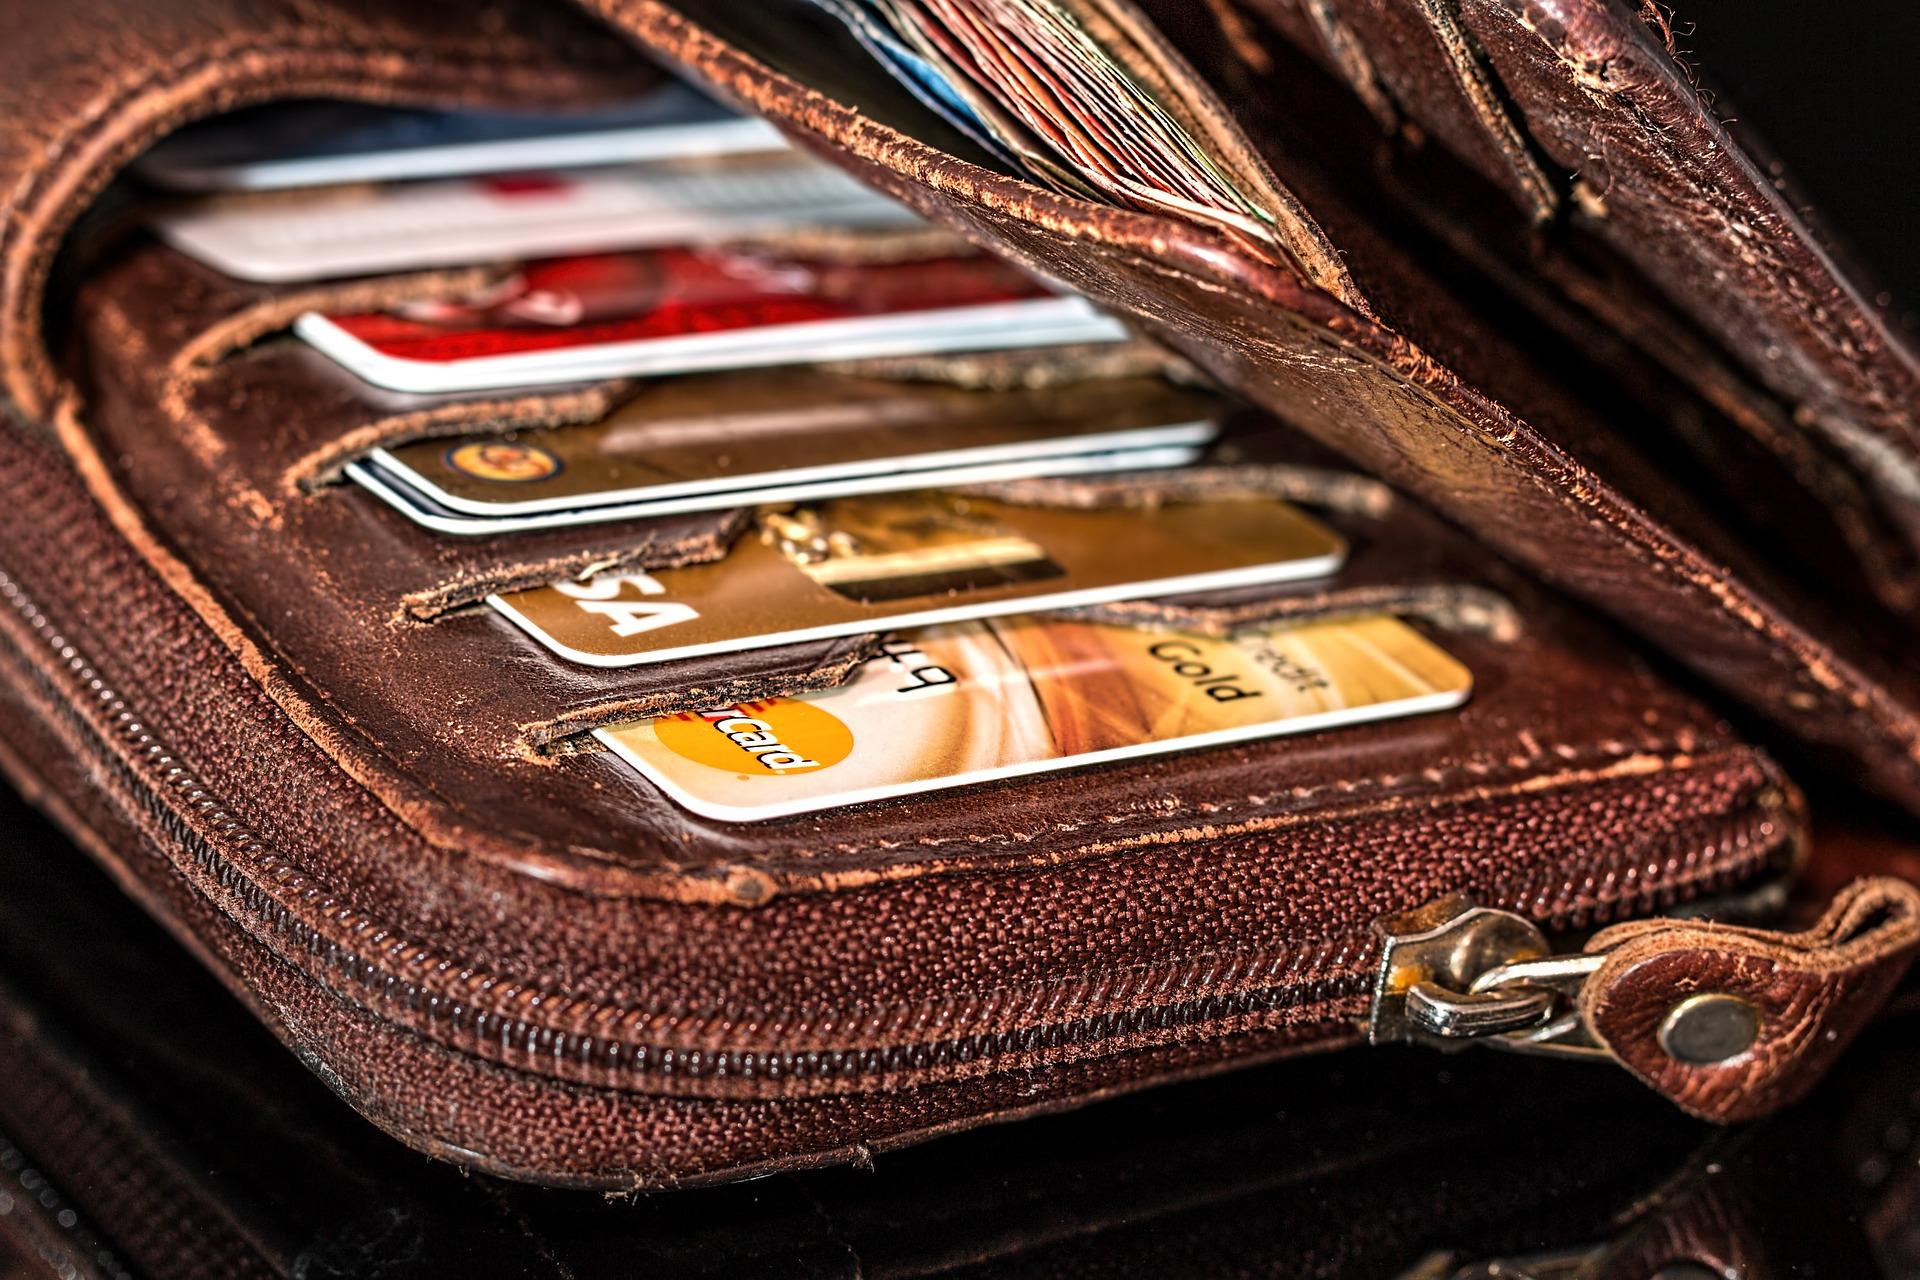 wallet-908569_1920